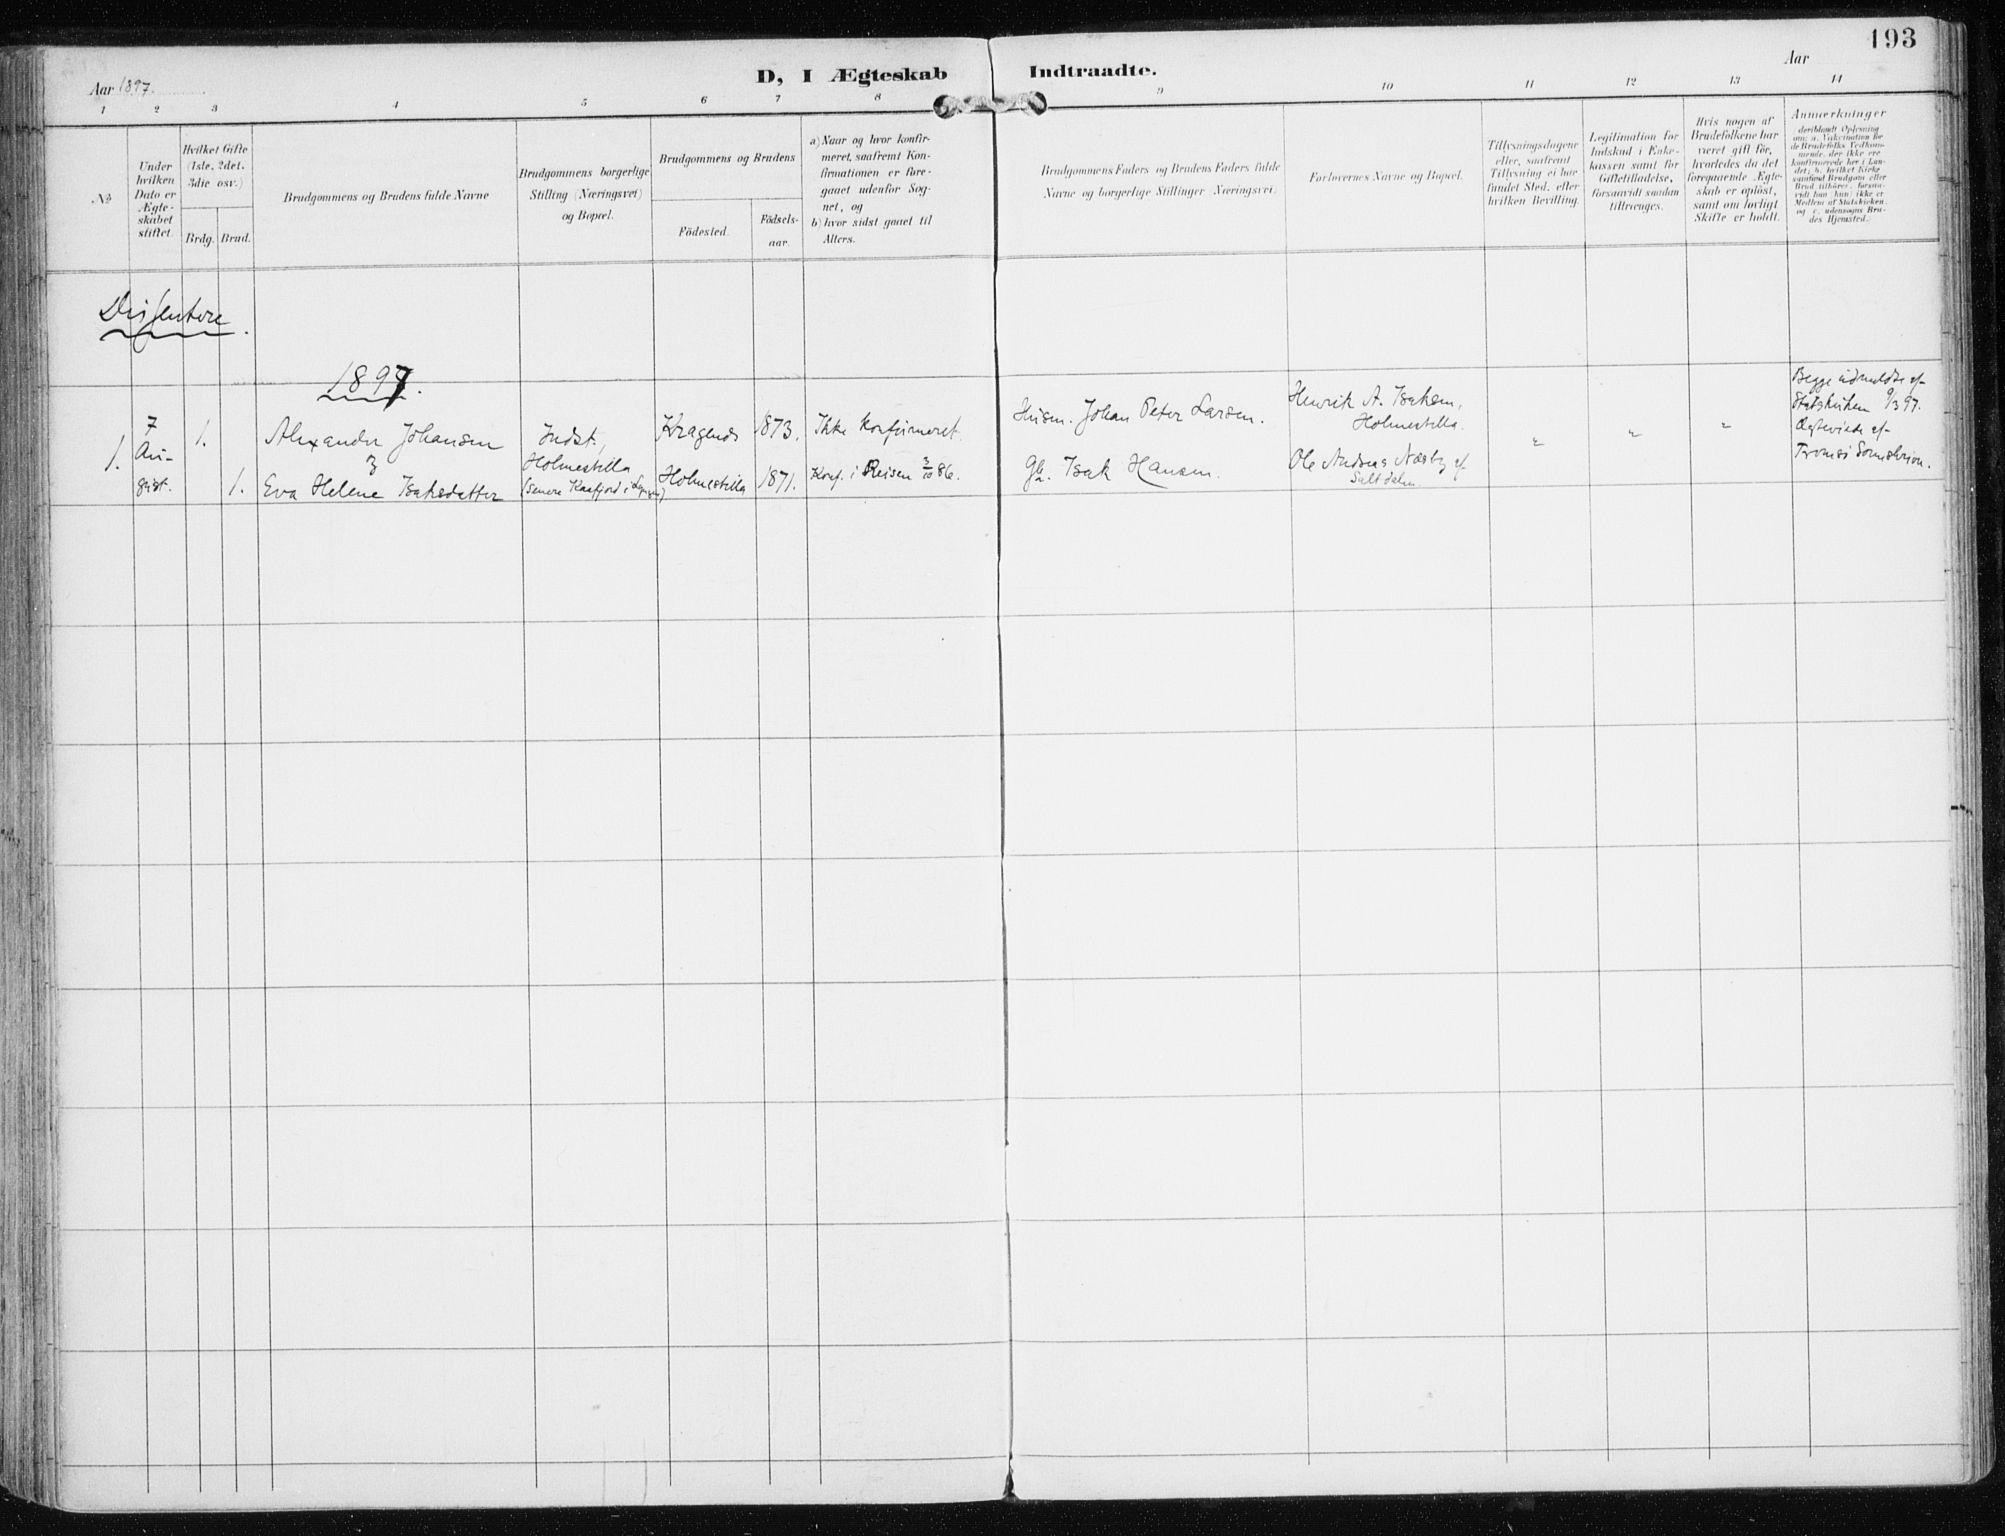 SATØ, Skjervøy sokneprestkontor, H/Ha/Haa/L0017kirke: Ministerialbok nr. 17, 1895-1911, s. 193